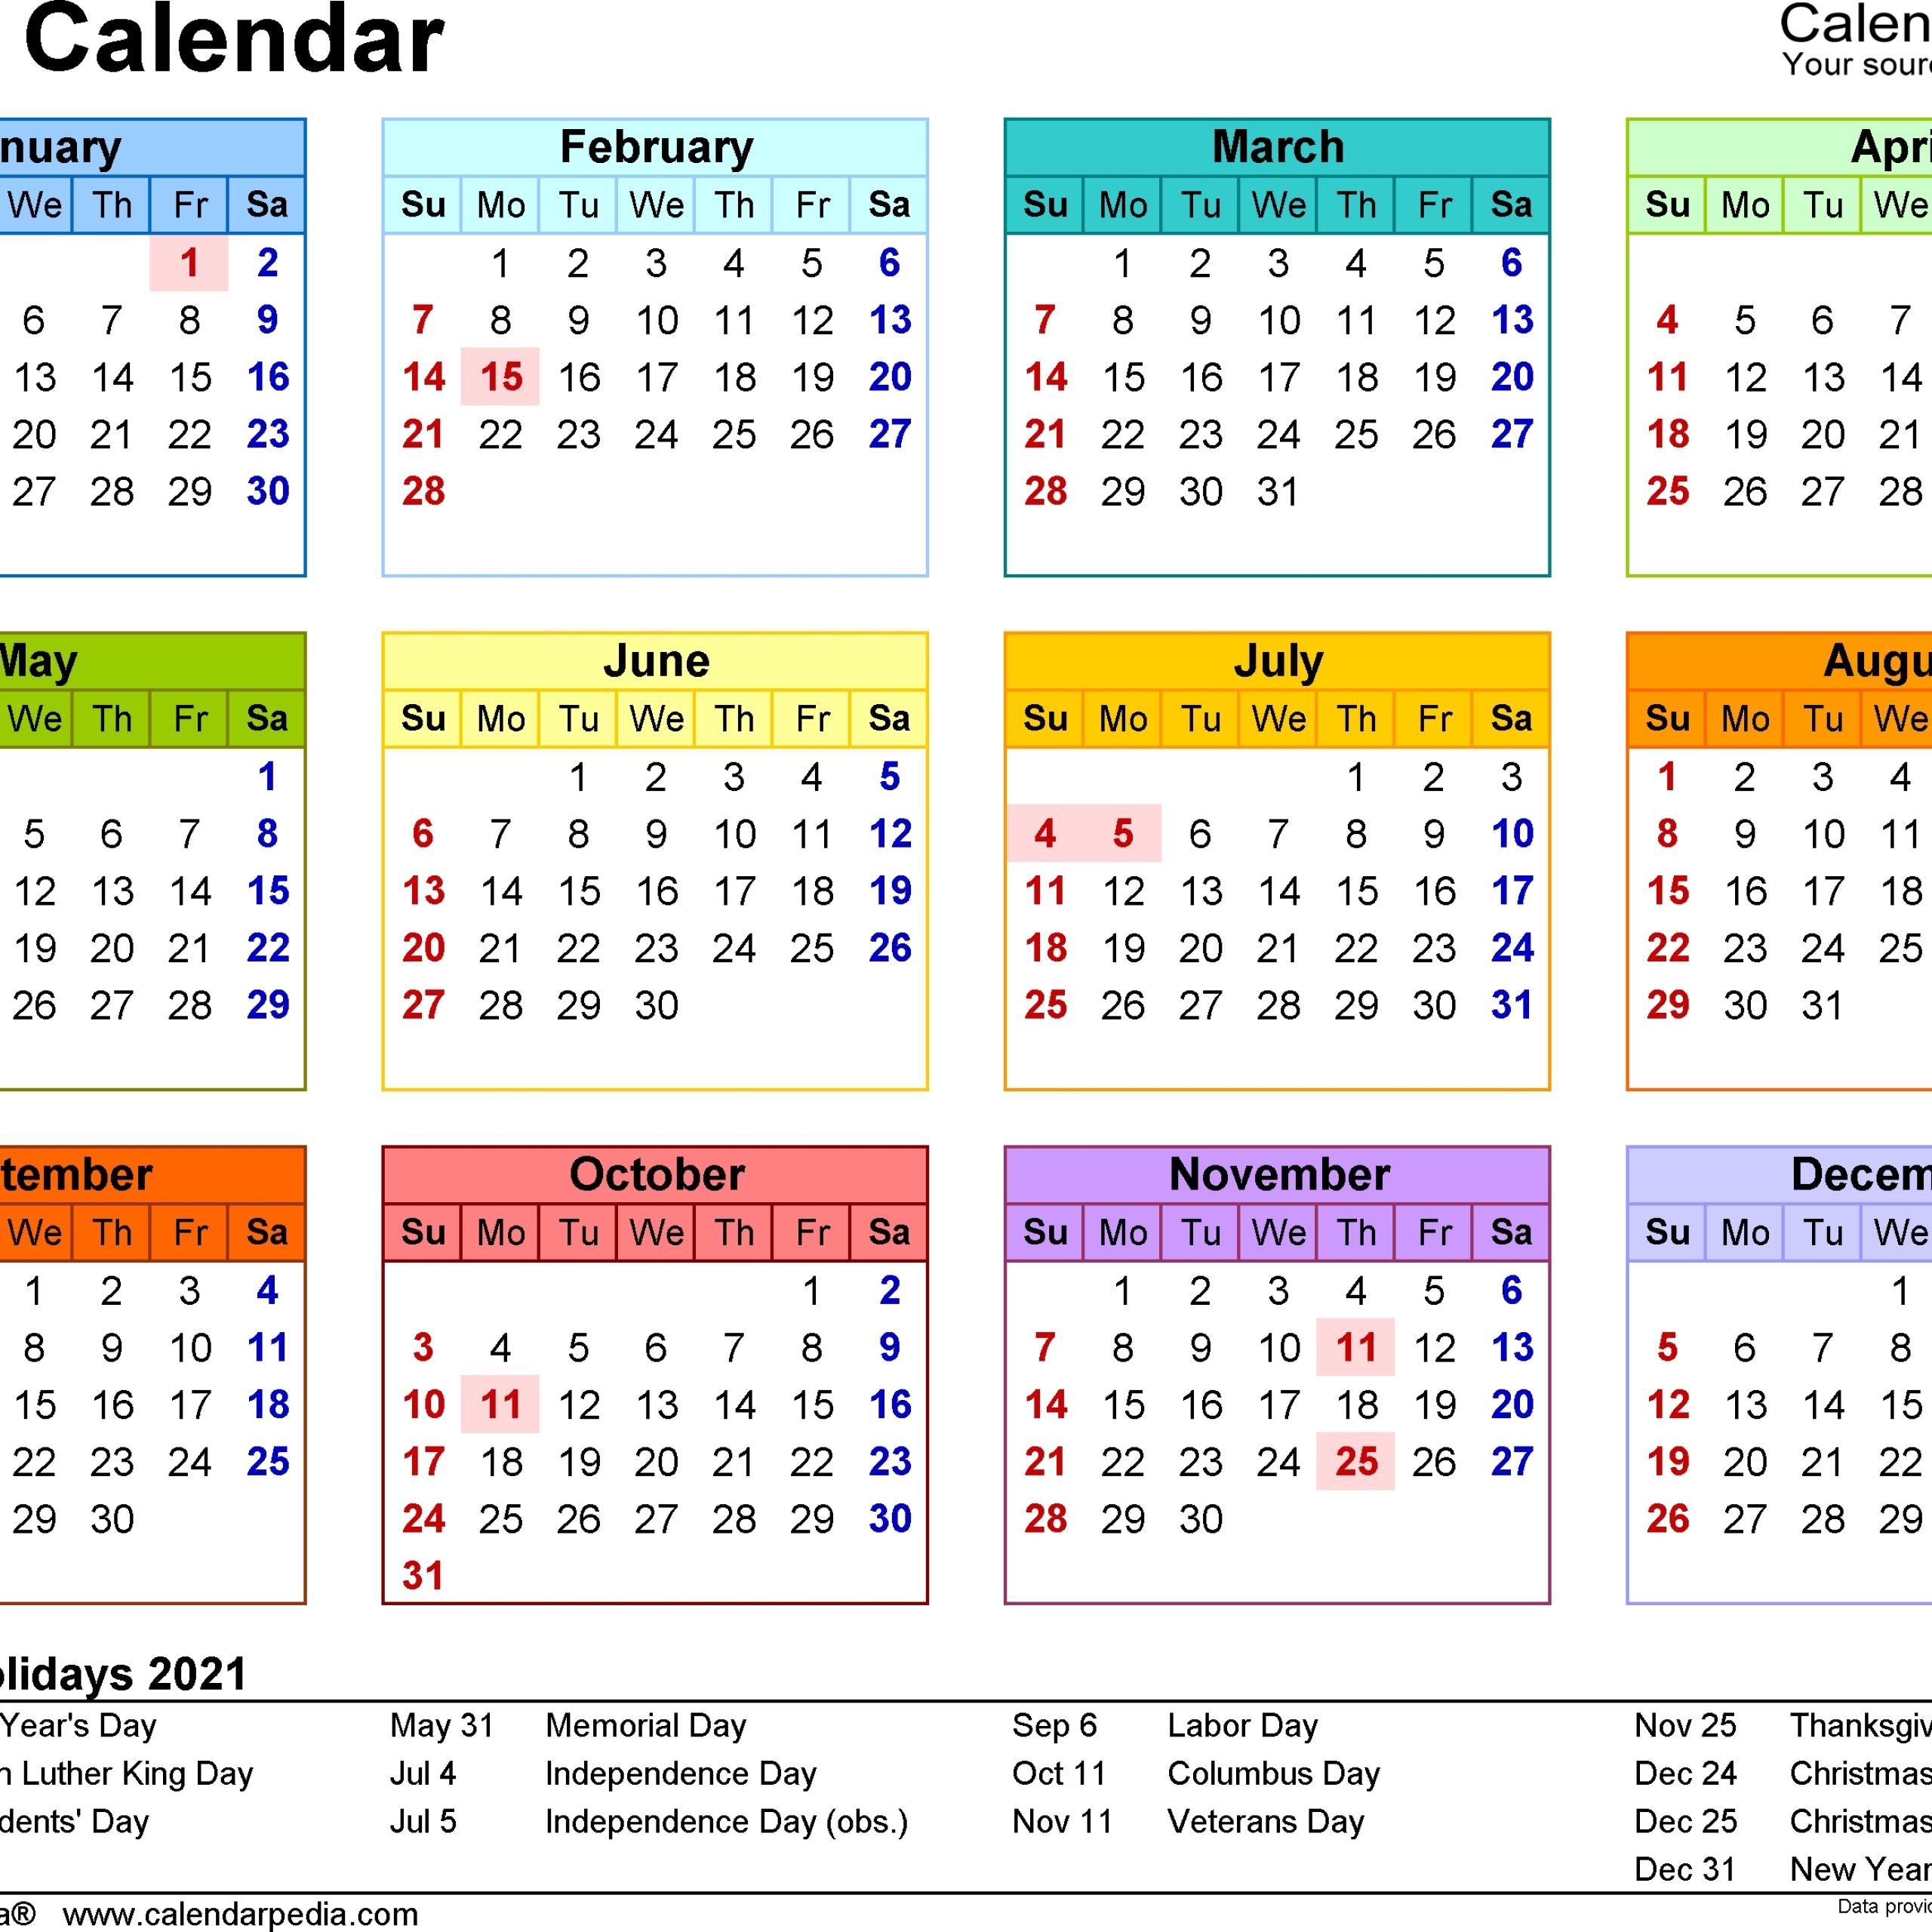 2021 Calendar South Africa In 2020 | Calendar Printables